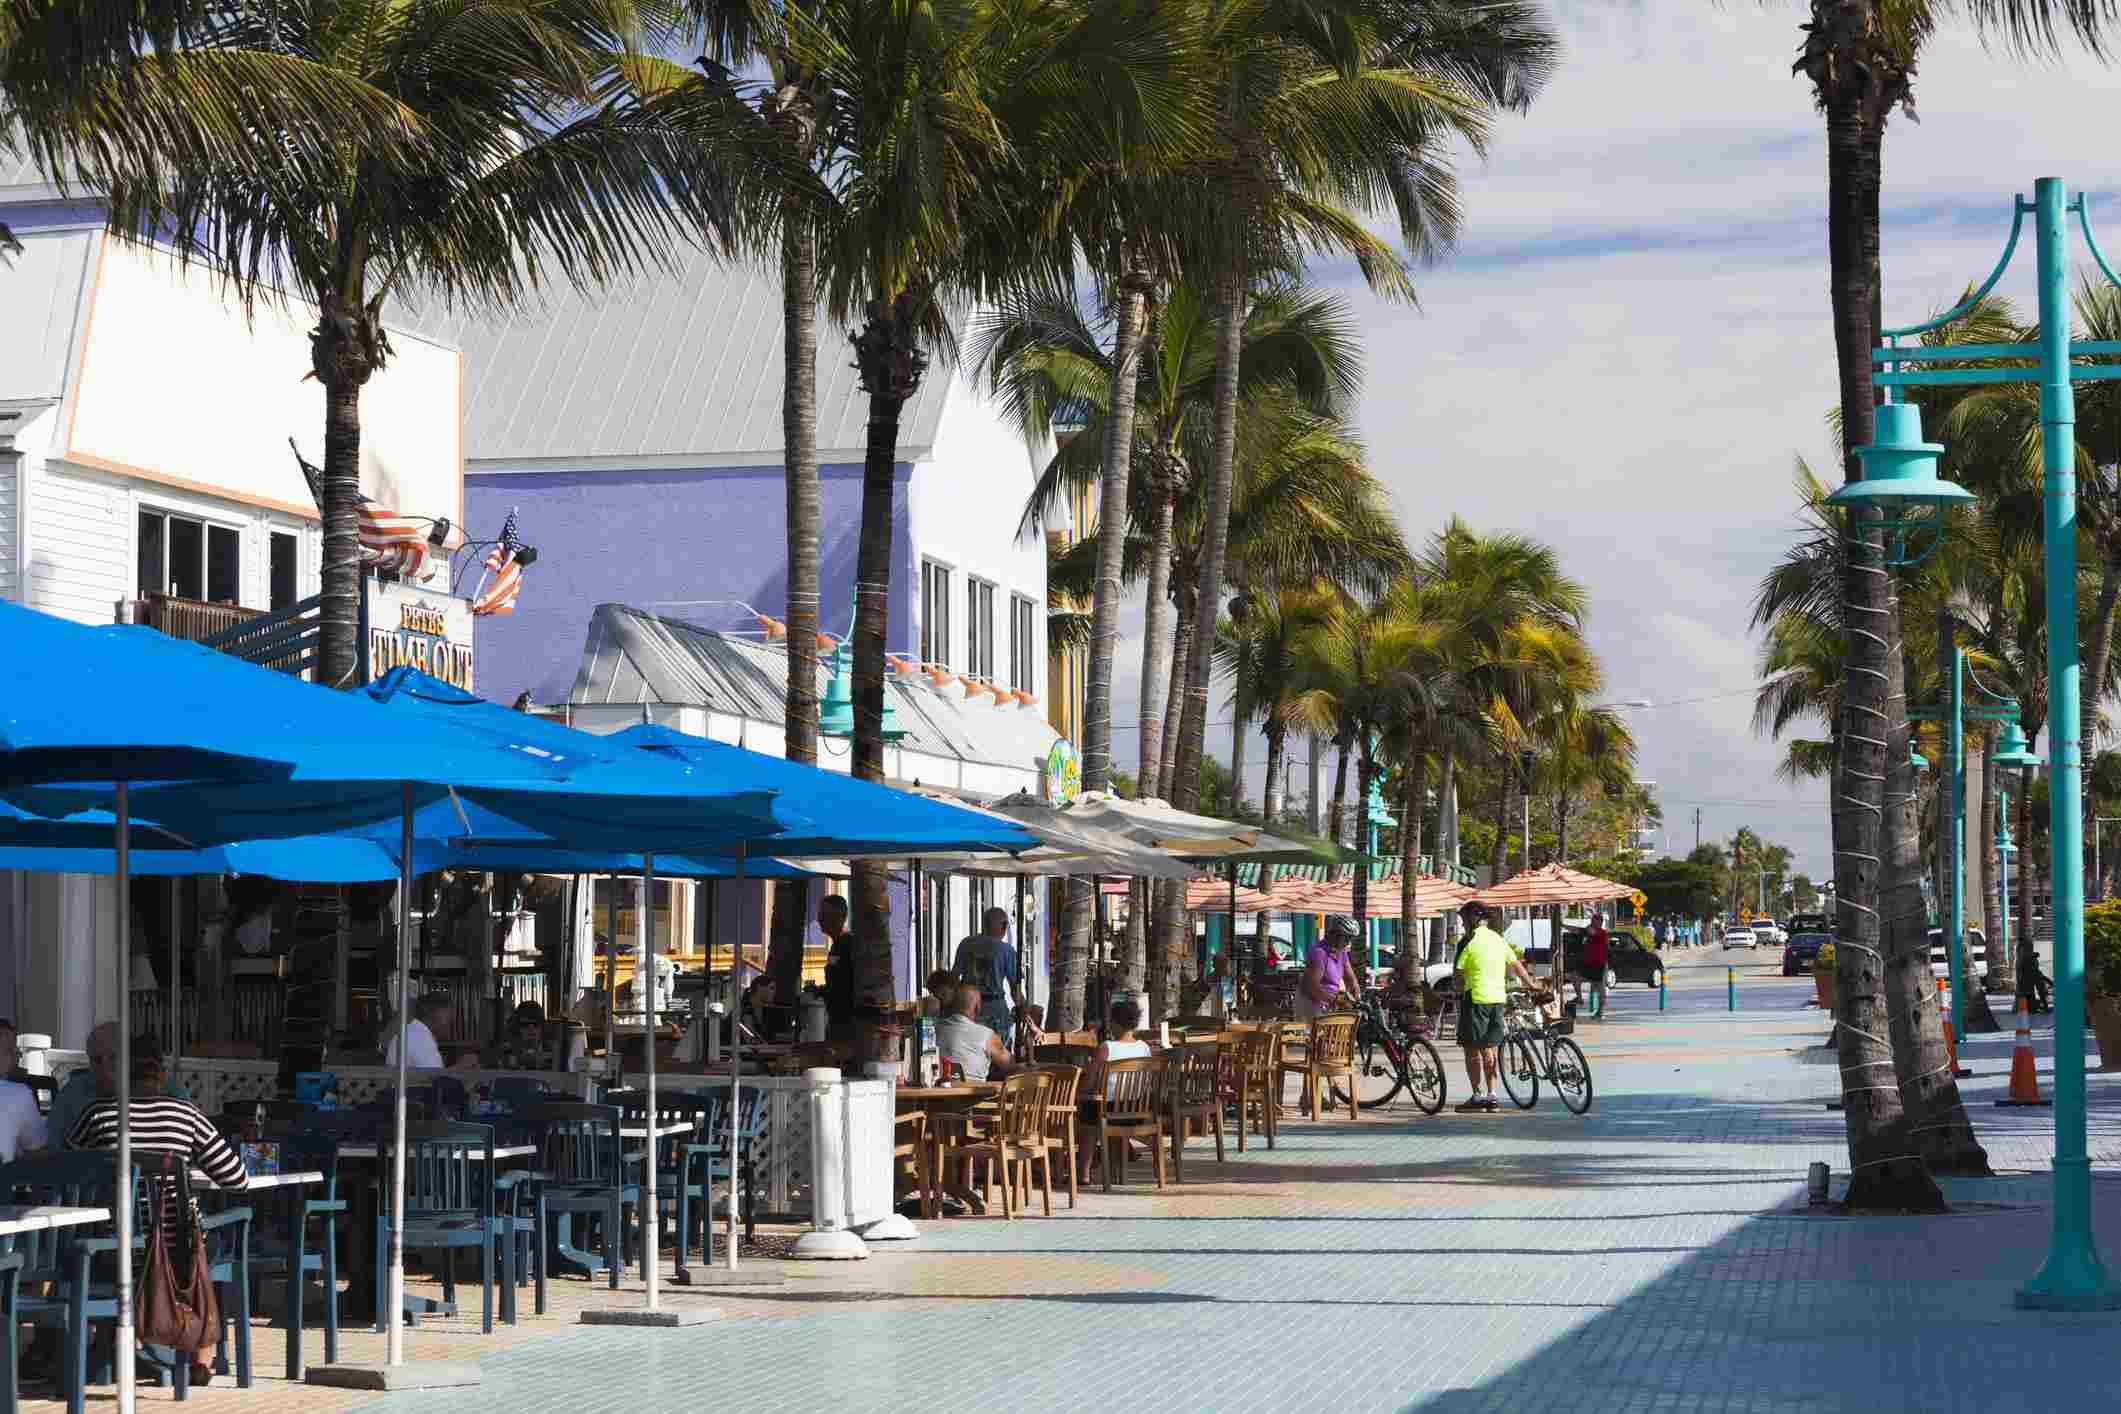 Beachfront cafes, Fort Myers Beach, Gulf Coast, Florida, USA